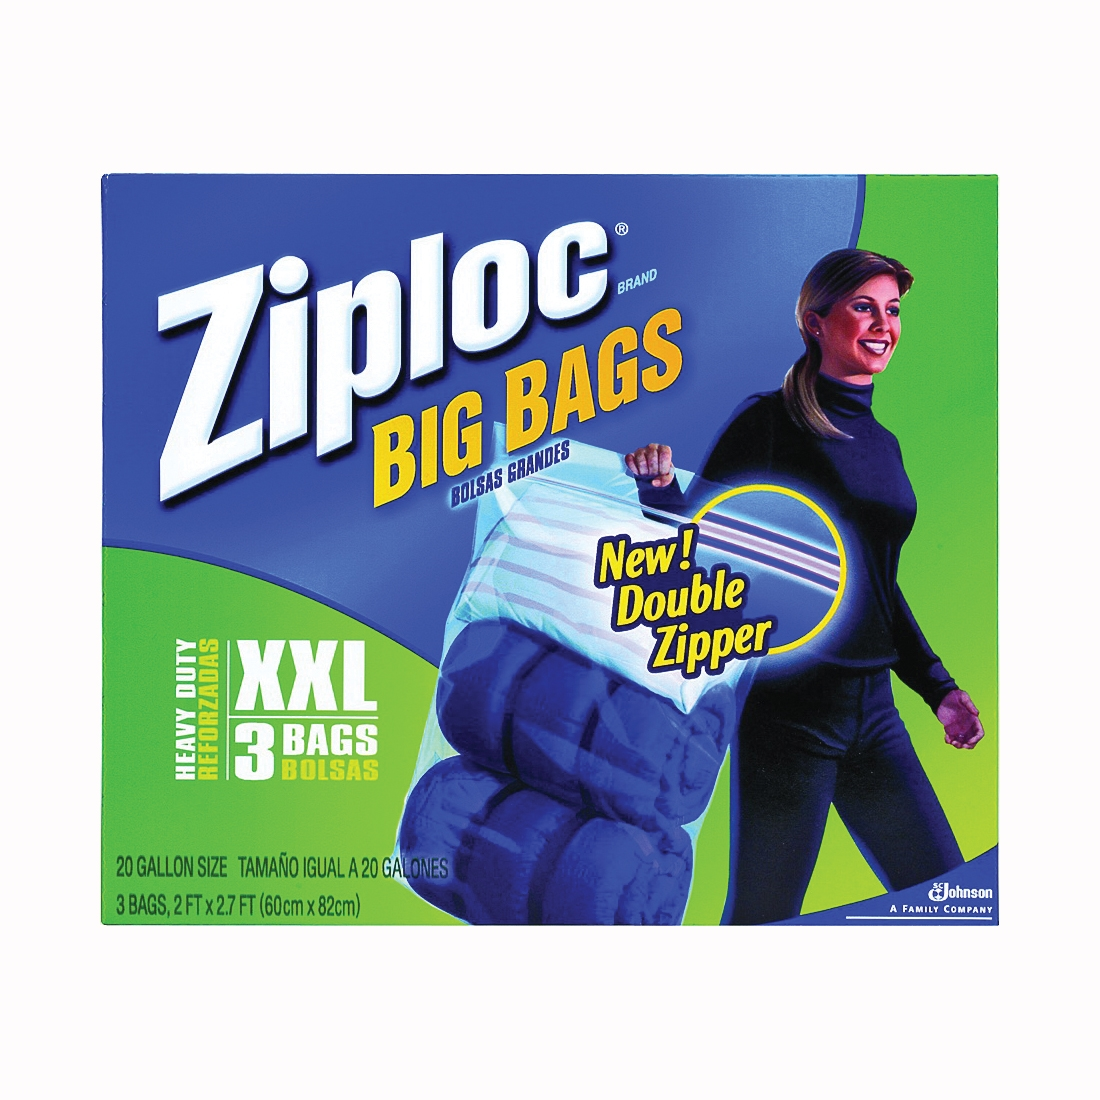 Picture of Ziploc Big Bag 71598 Flexible Tote, 20 gal Capacity, Plastic, Clear, Zipper Closure, 24 in L, 32-1/2 in W